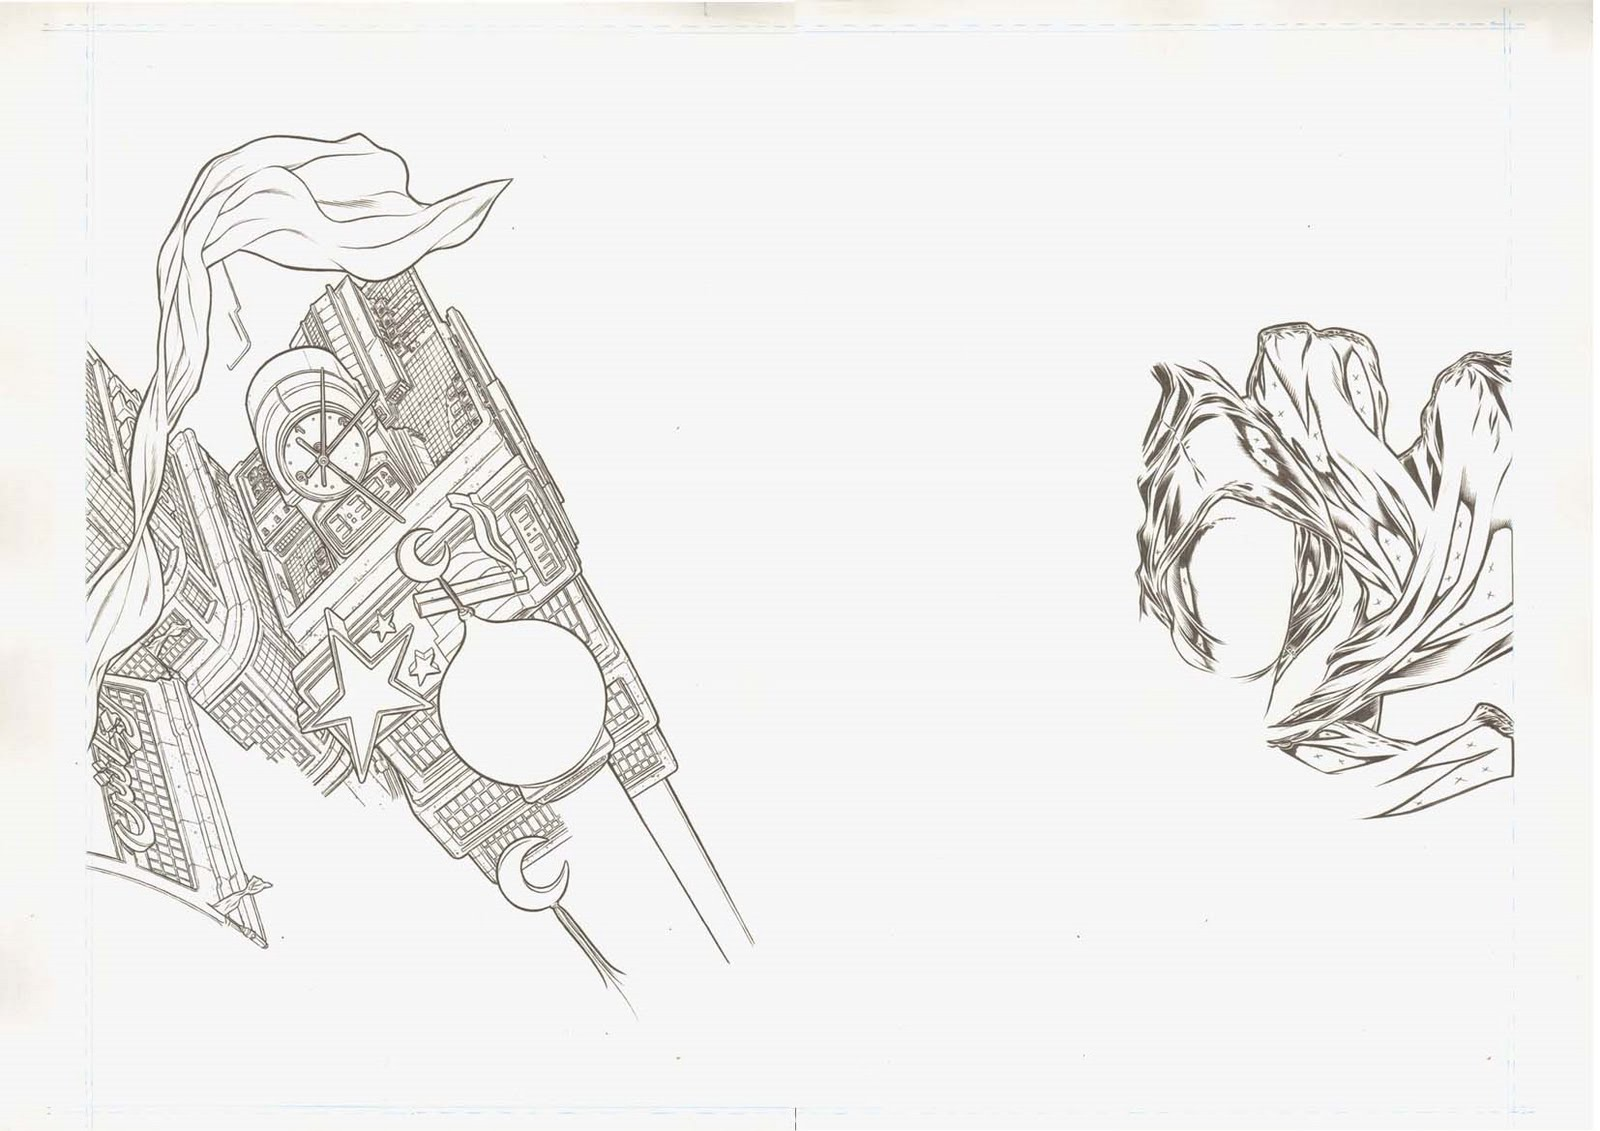 [Inking+ANNAMERCURY]